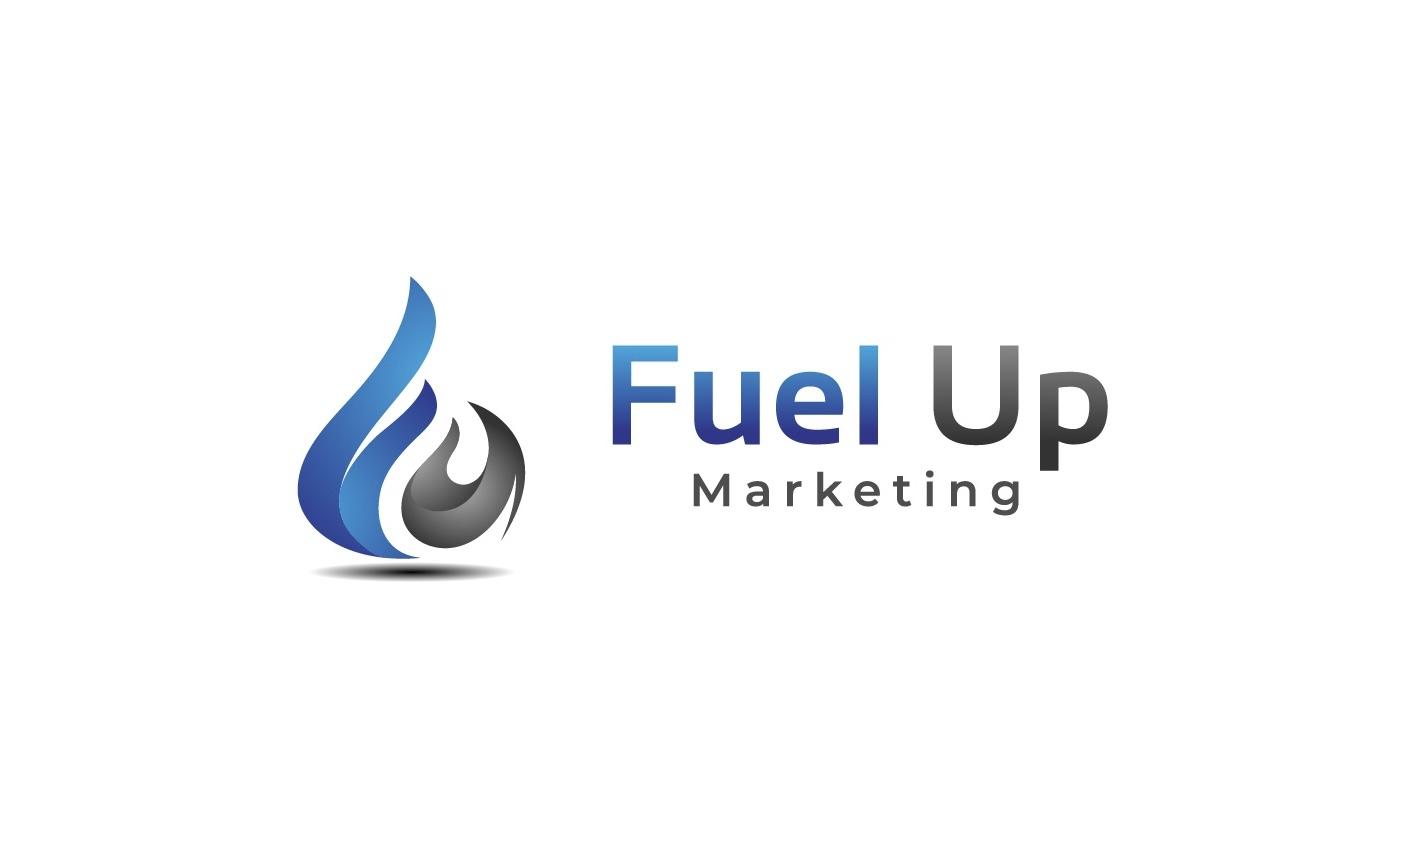 Fuel Up Marketing